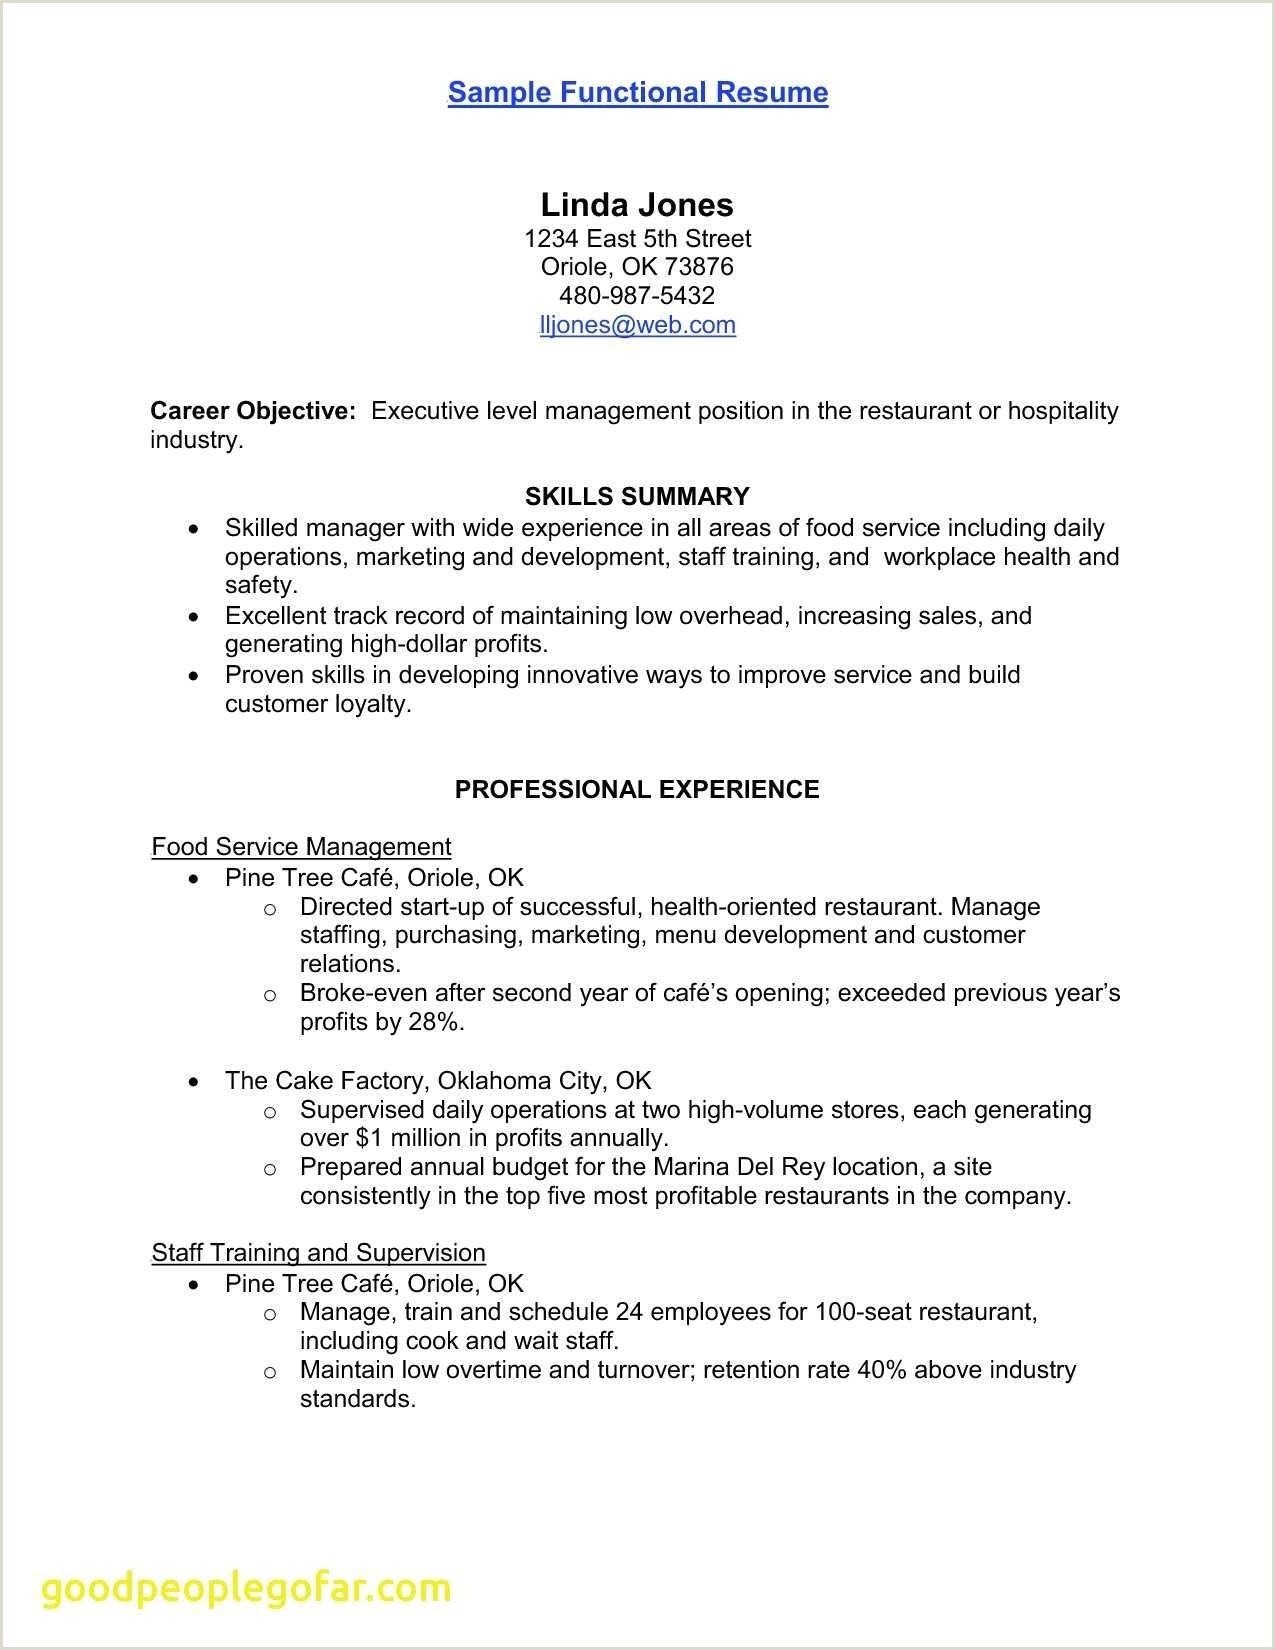 Sales and Marketing Resumes Examples Elegant Marketing Resume Summary